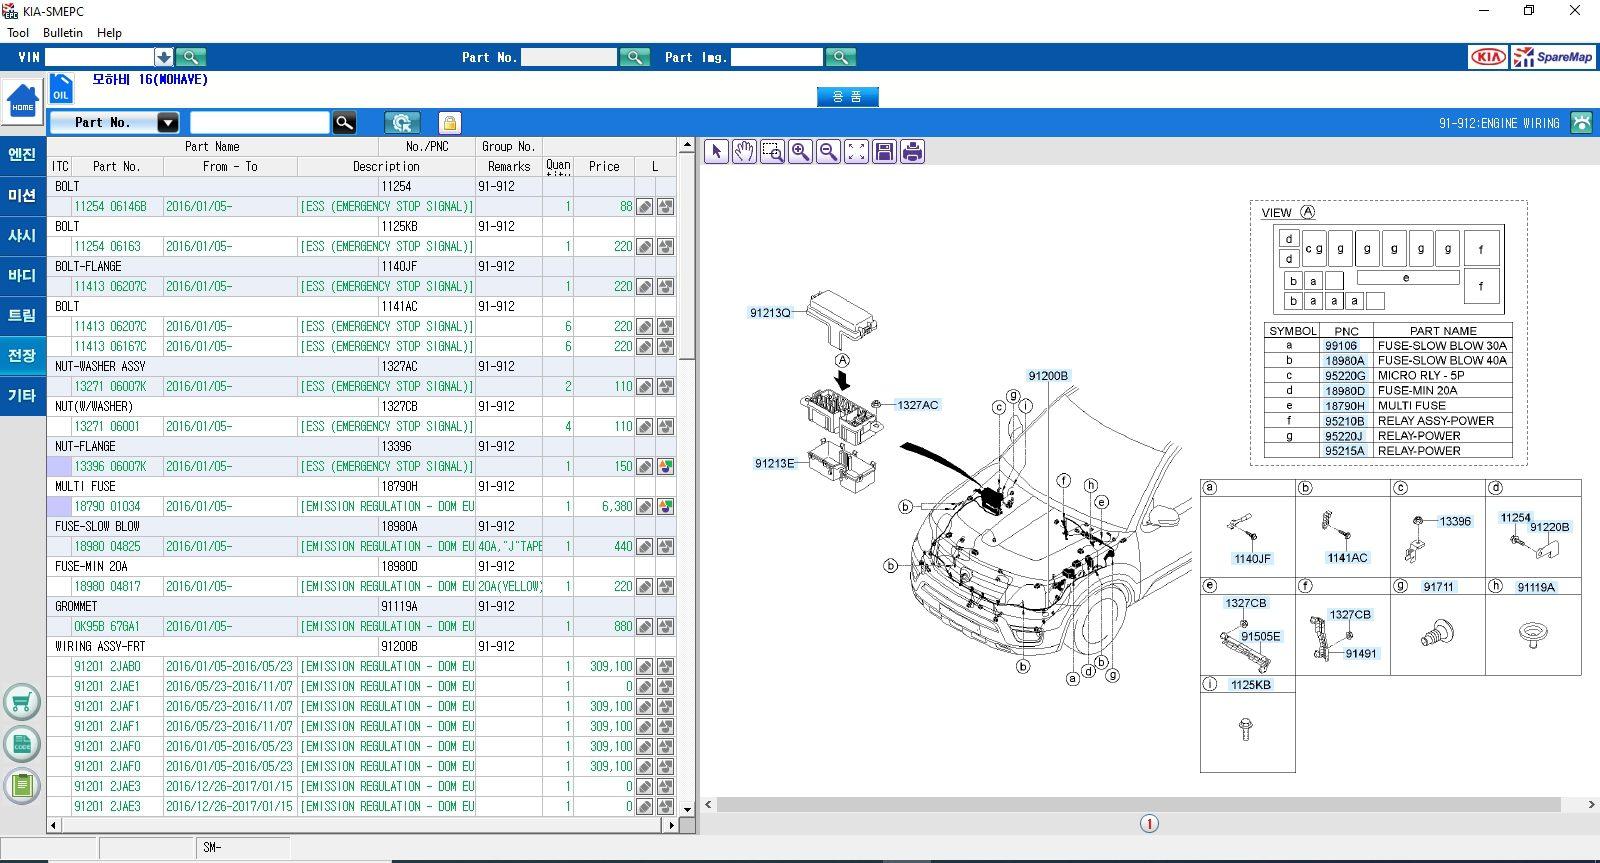 Hyundai_Kia_Korea_SM_EPC_072019_Parts_Catalog_Domestic_Market_6